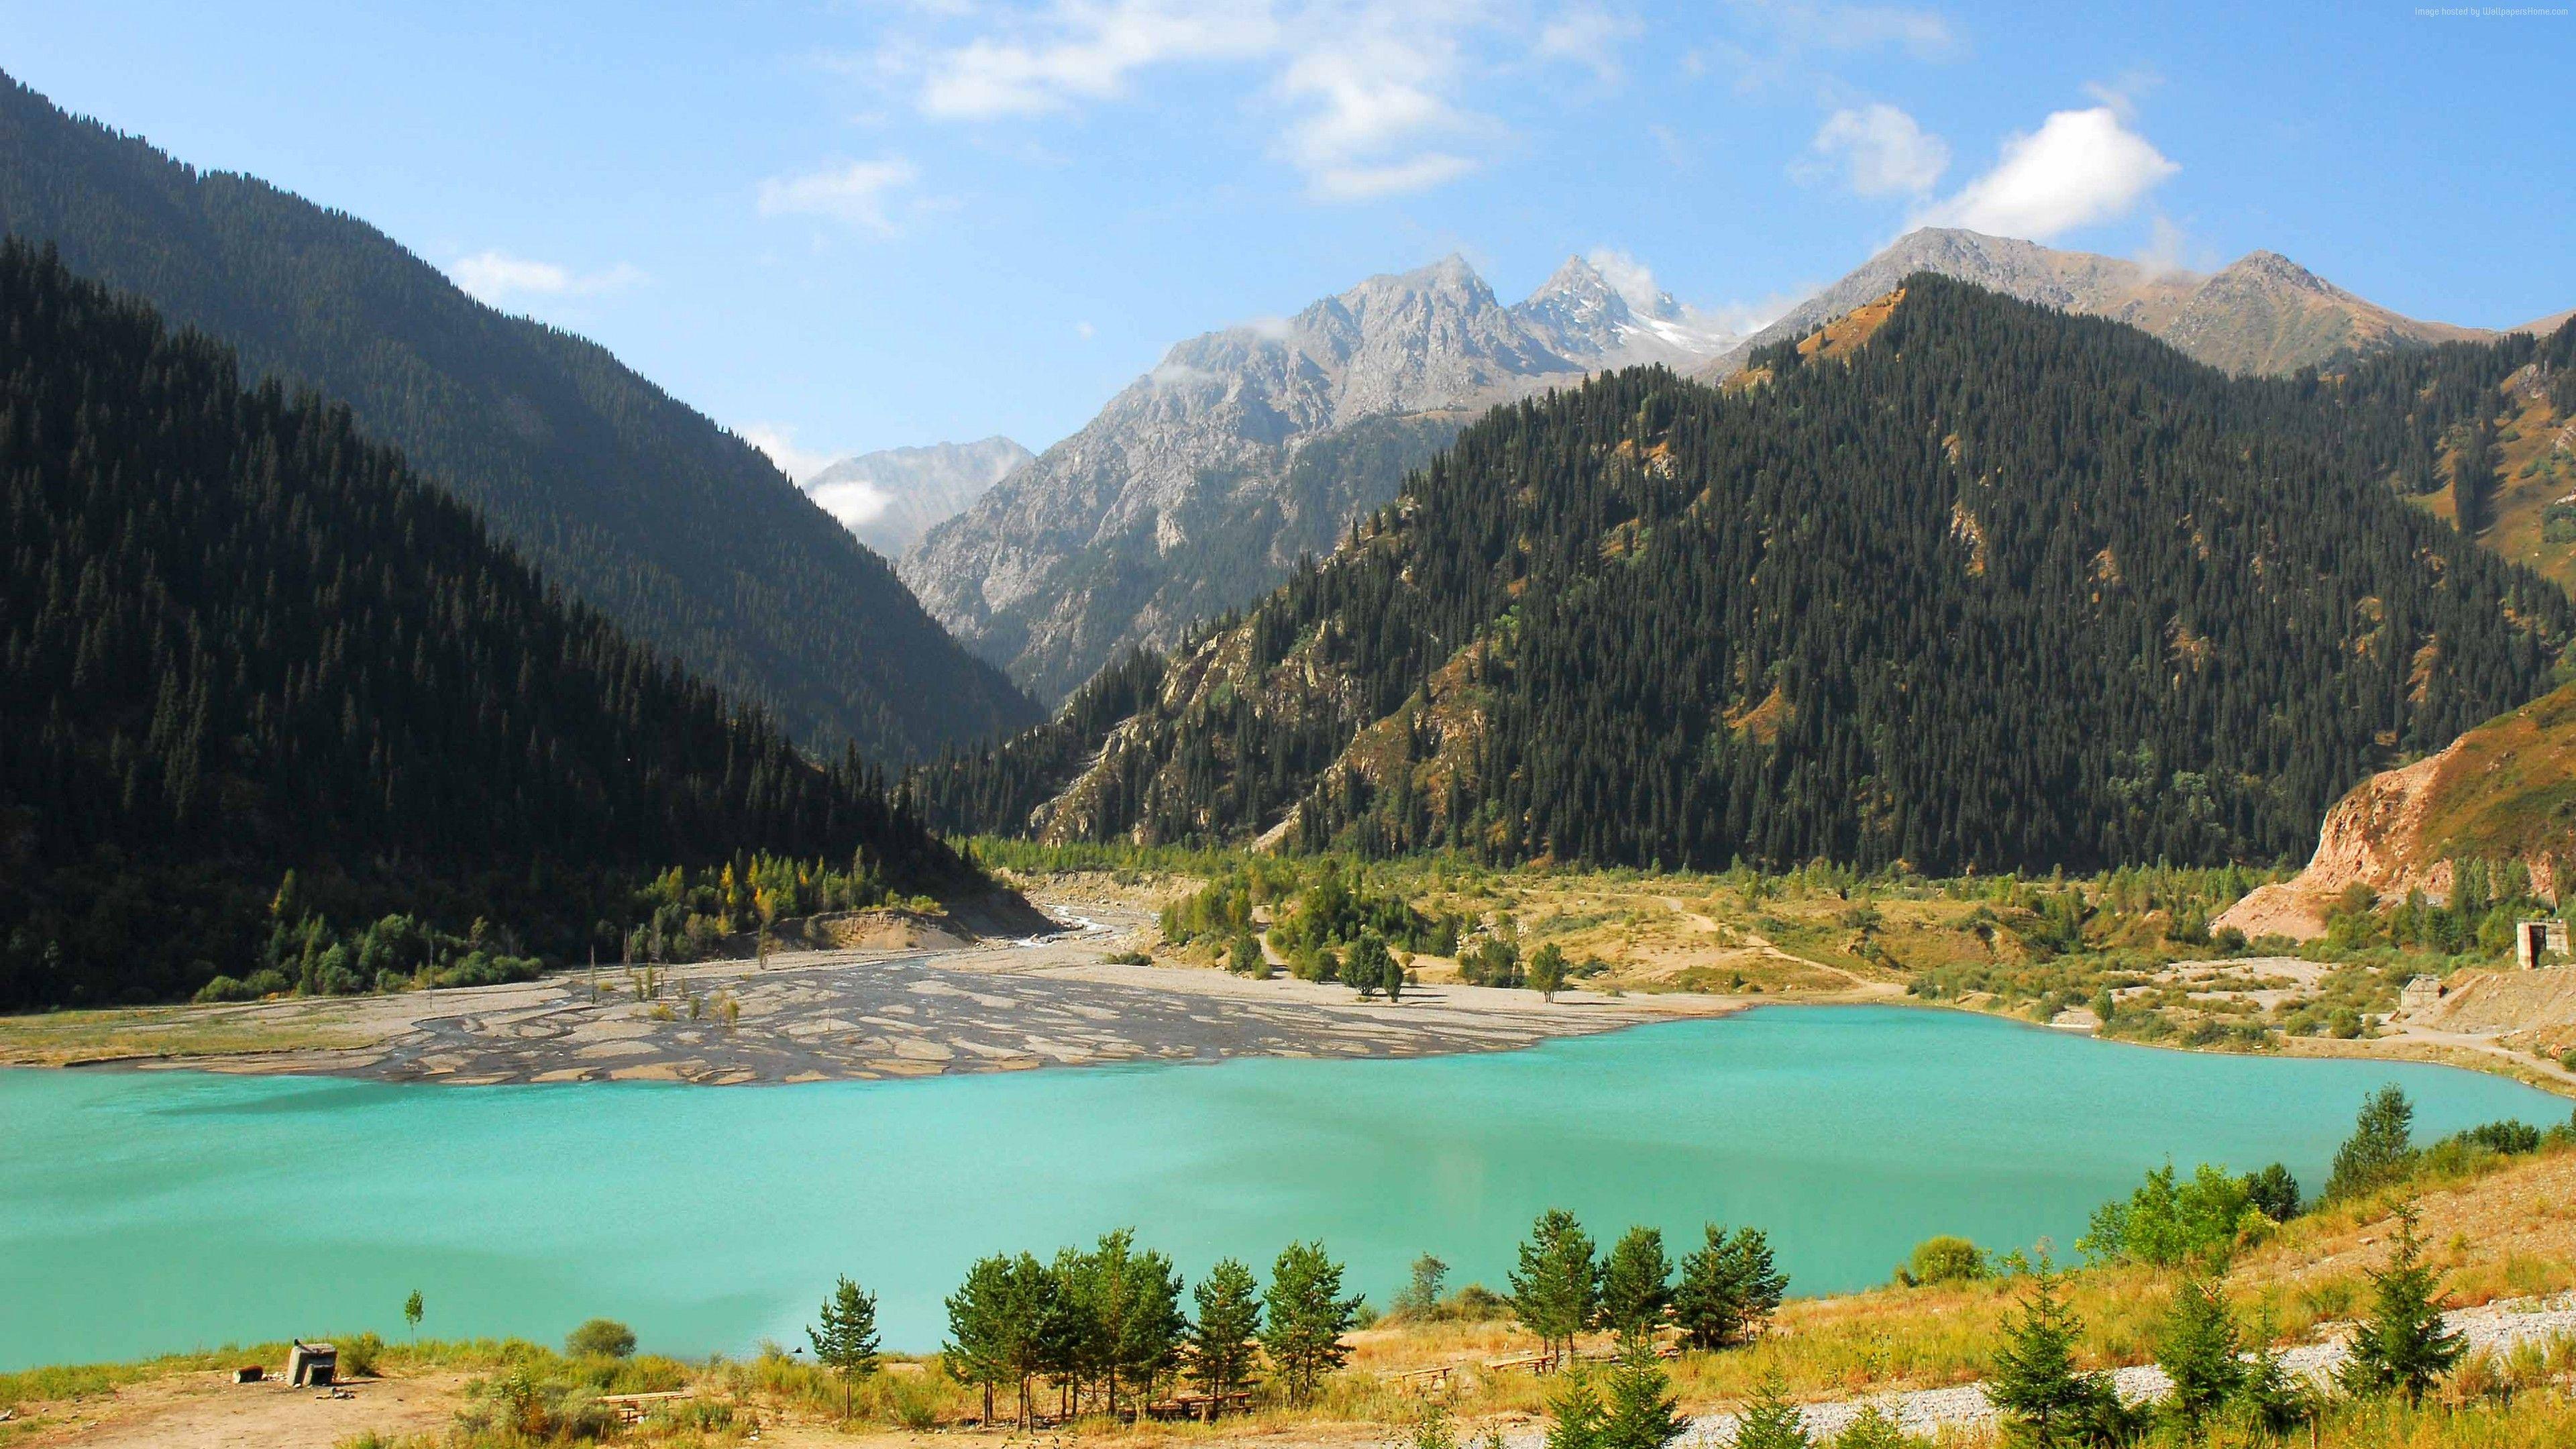 Wallpaper Lake Issyk Kul Kyrgyzstan Mountains Forest 4k Travel Http Www Pxwall Com Wallpaper Lake Issyk Kul Kyrgy Lake Travel Wallpaper Hd Wallpaper